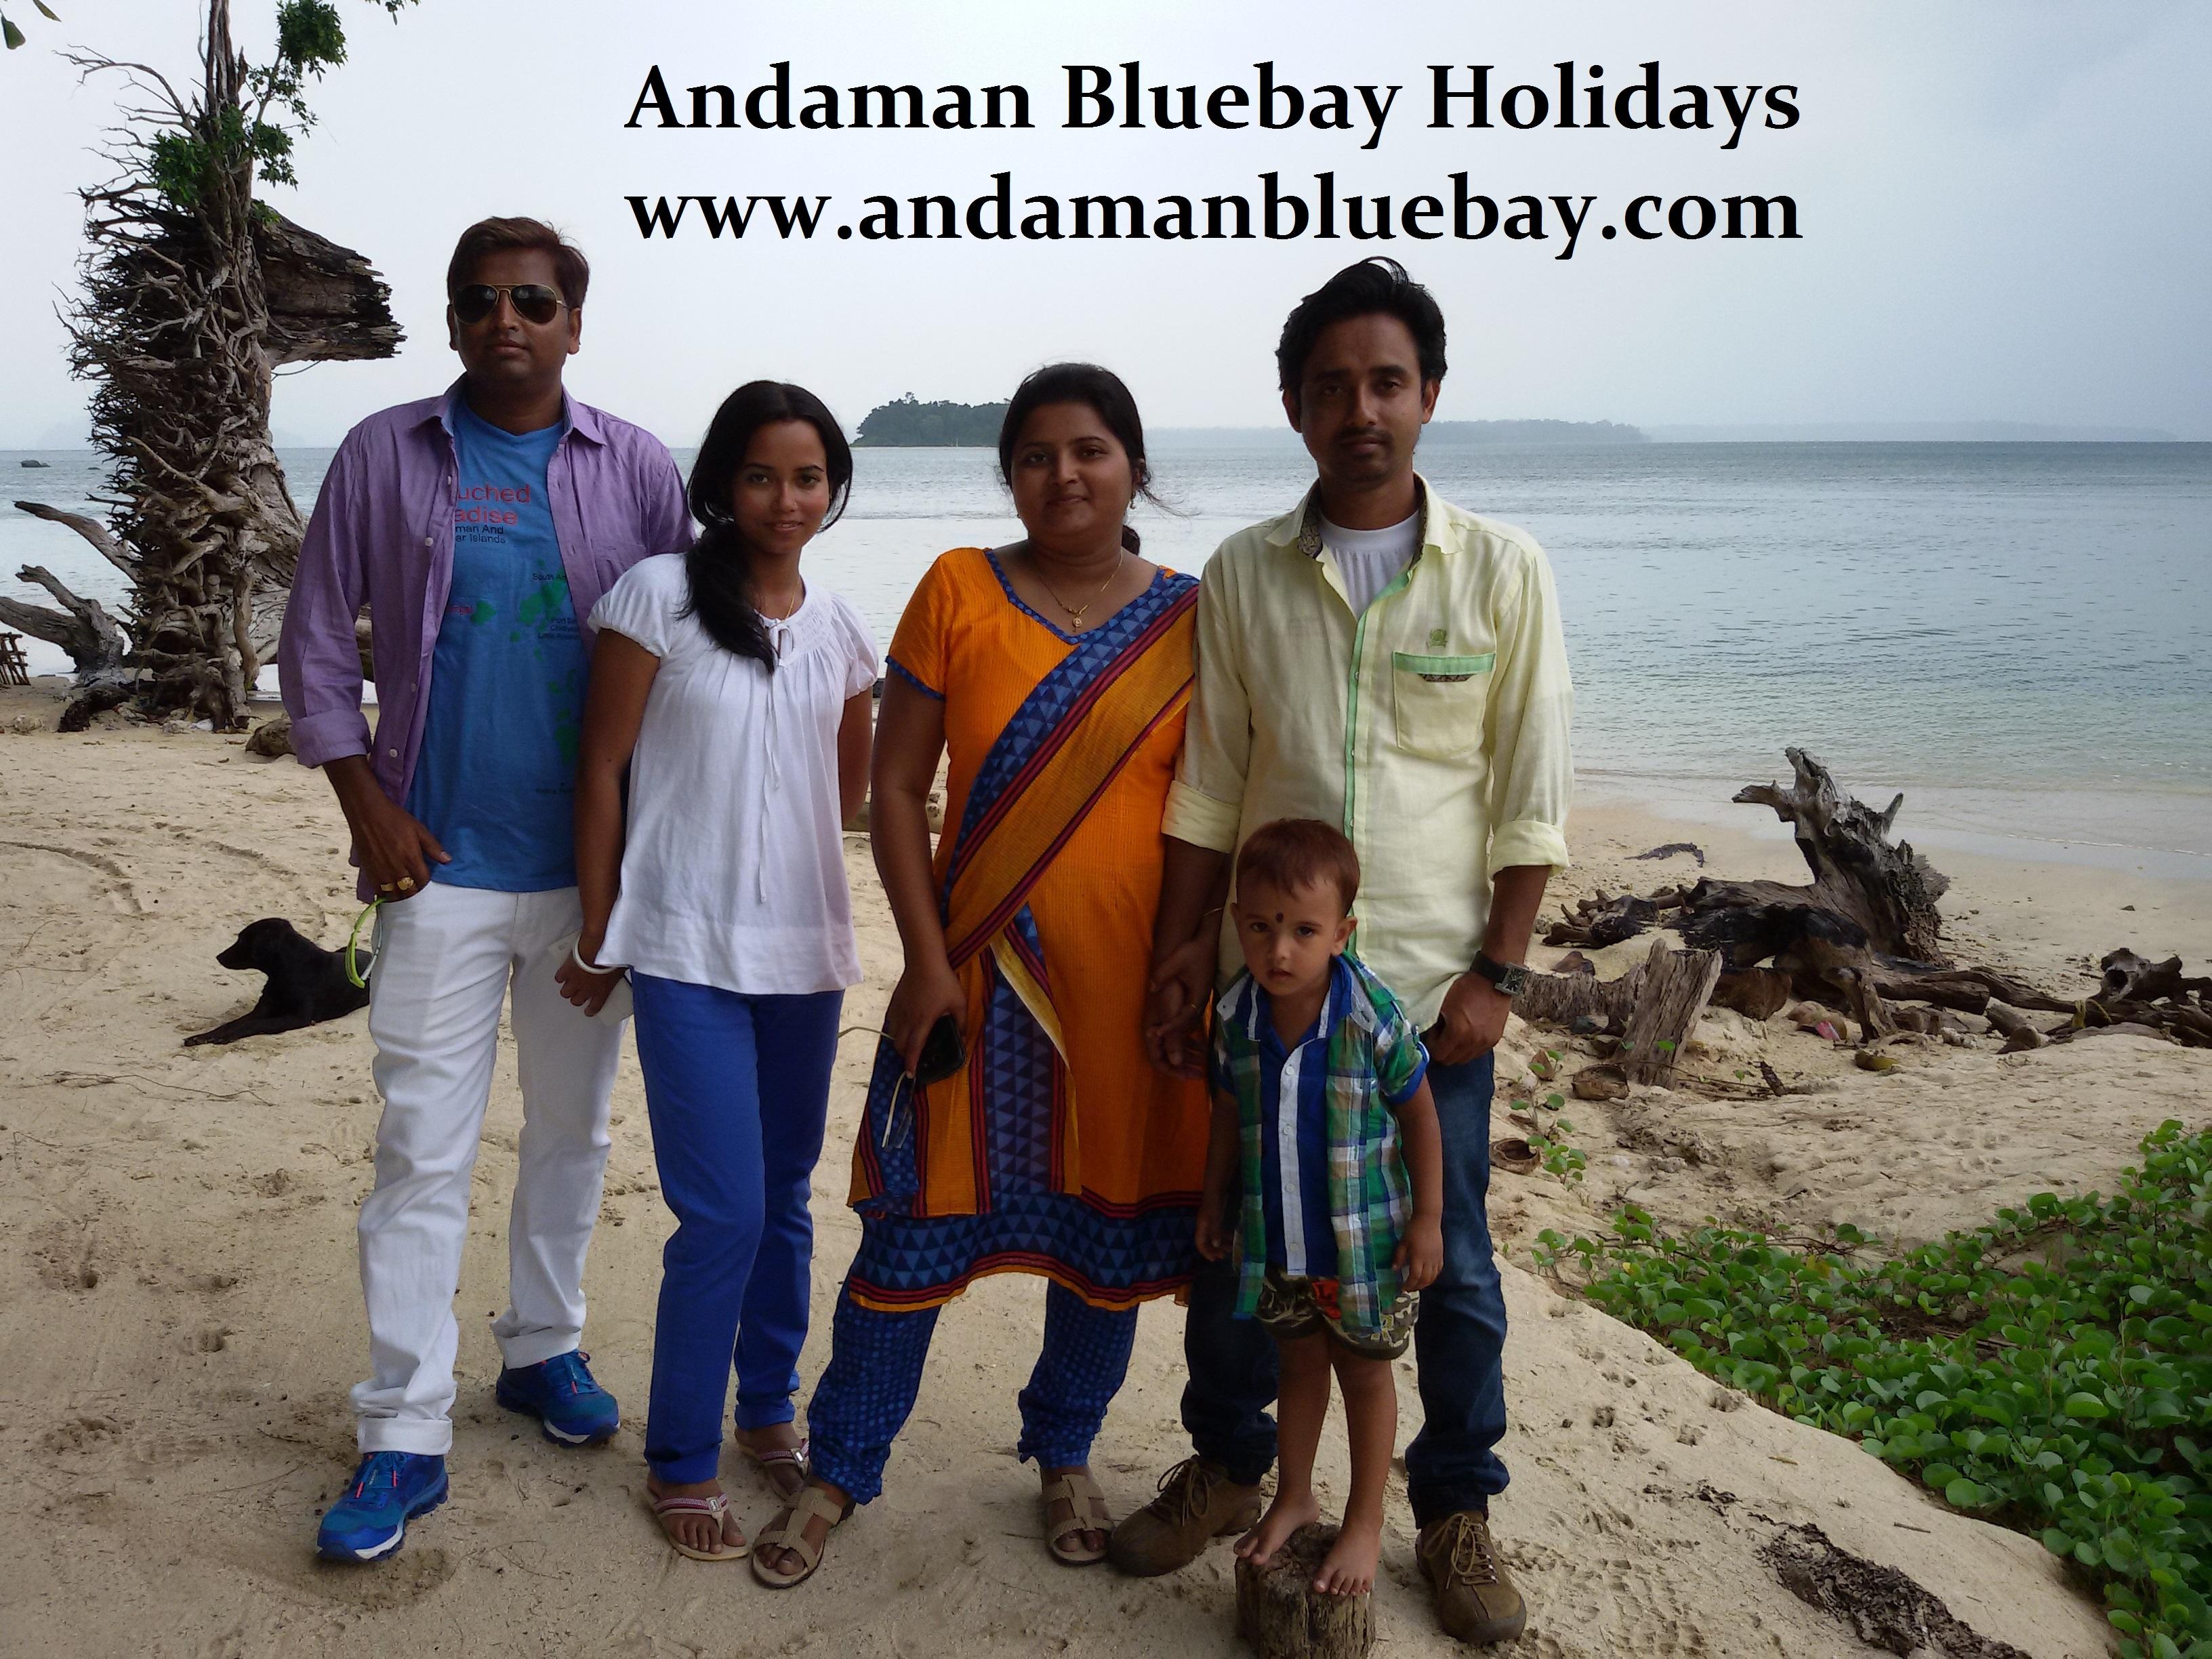 Andaman_Bluebay_Holidays_Clients_www_andamanbluebay_com